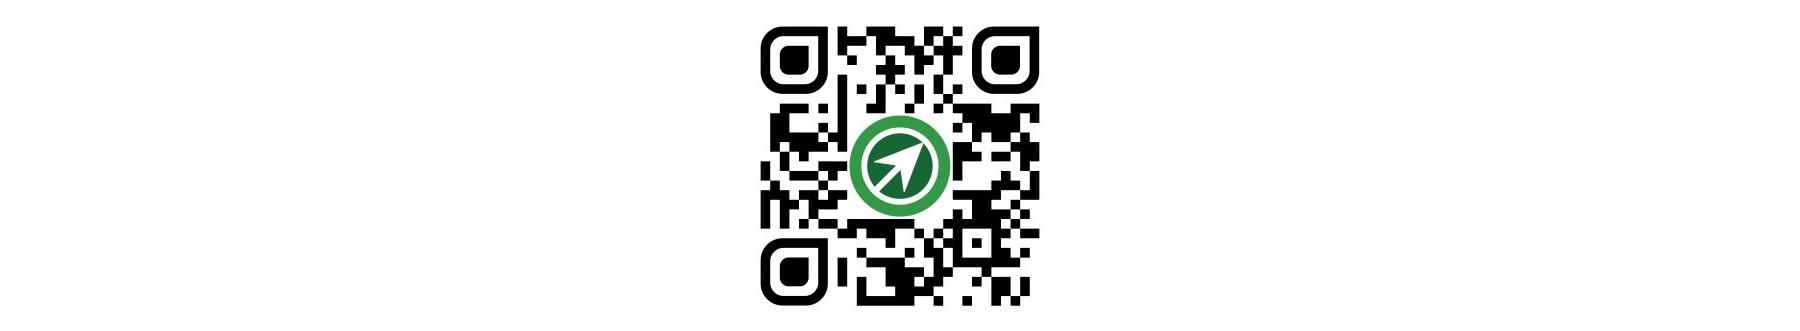 https://campaign-image.com/zohocampaigns/479159000000377417_zc_v141_otds_qrcode_for_newsletter2.jpg